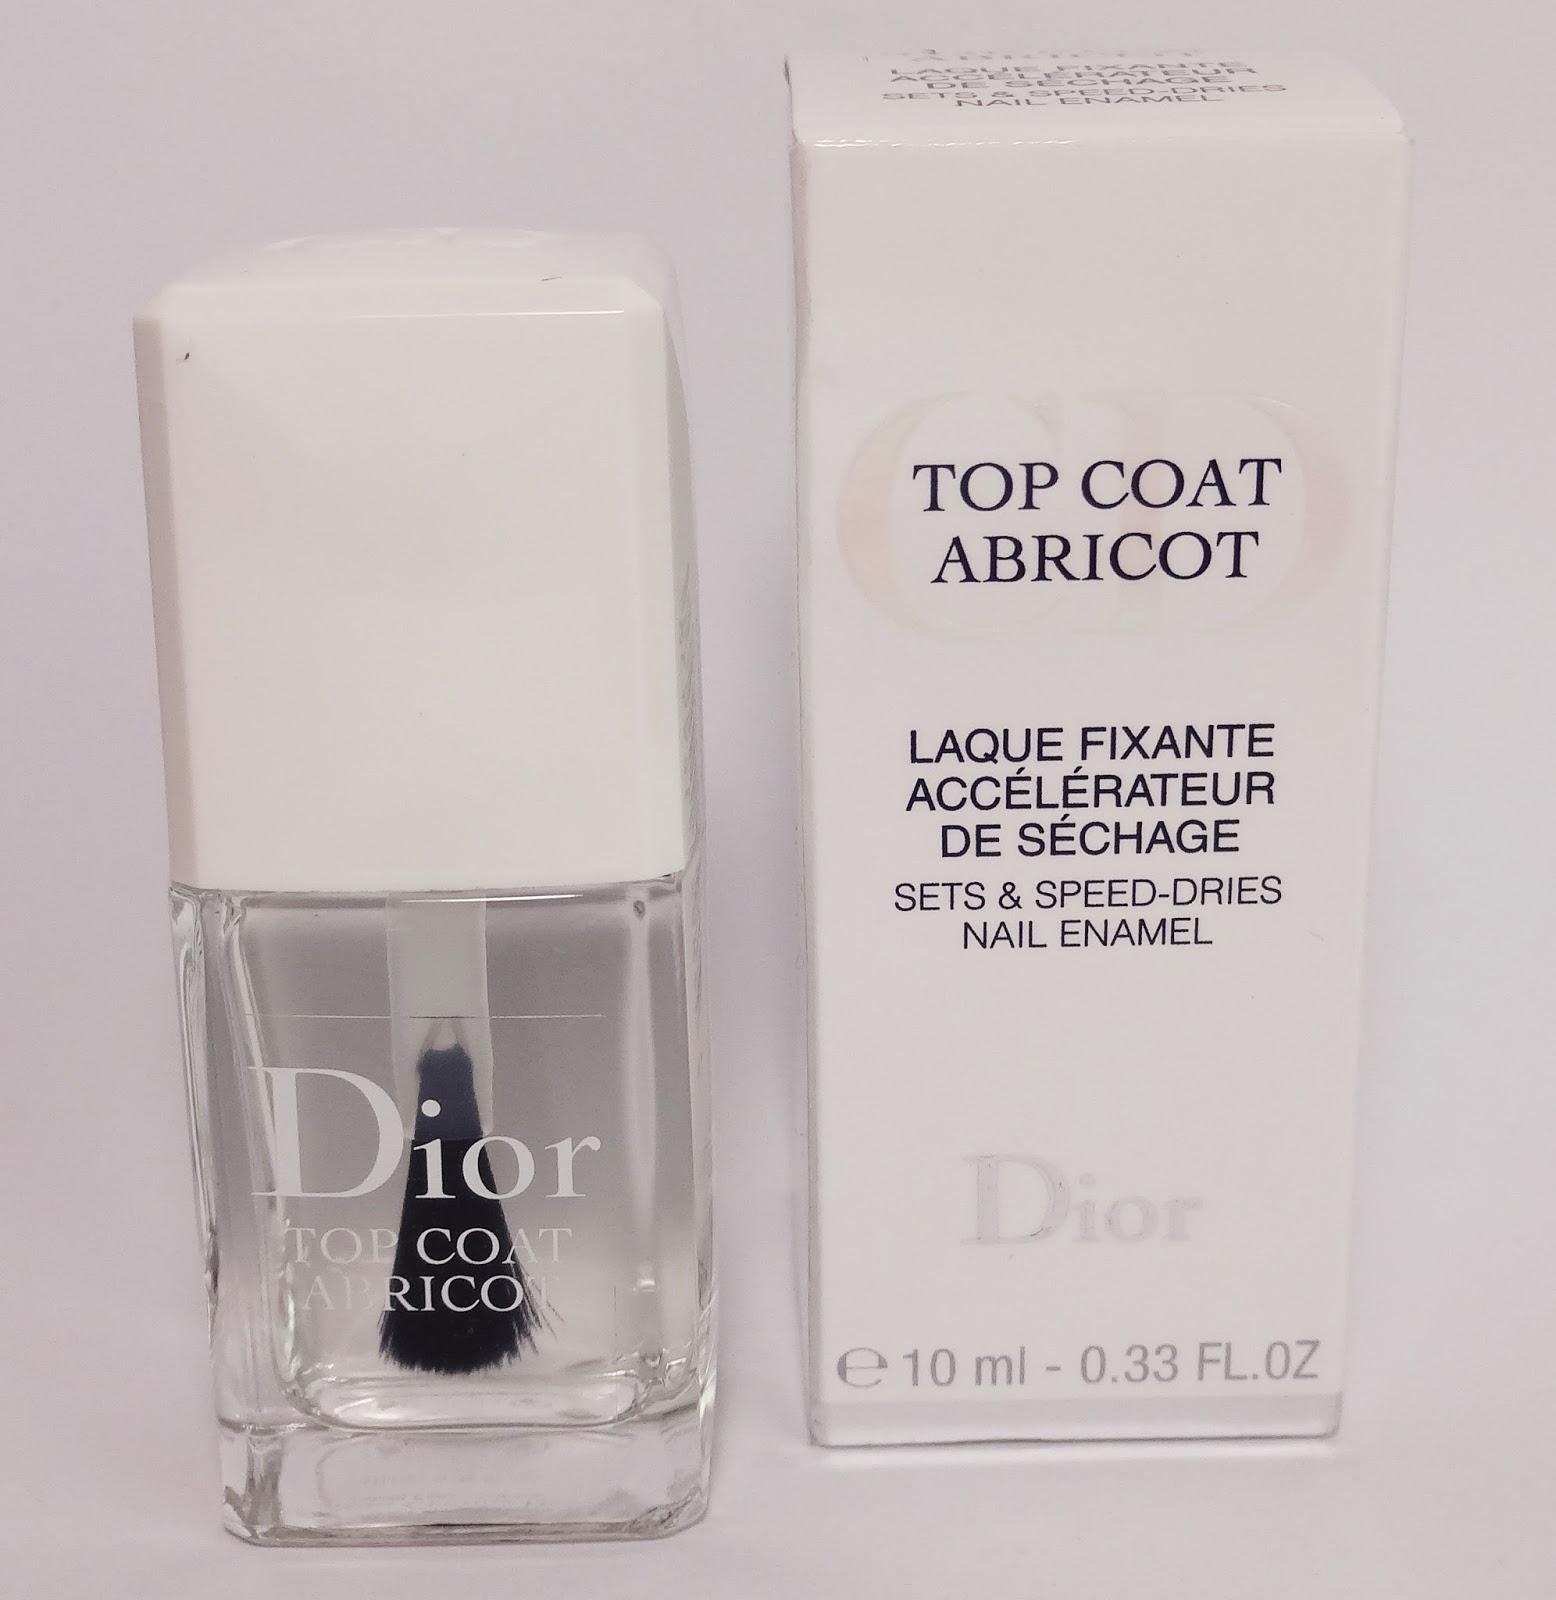 Dior - Top Coat Abricot Überlack farblos Pretty Clover Beautyblog